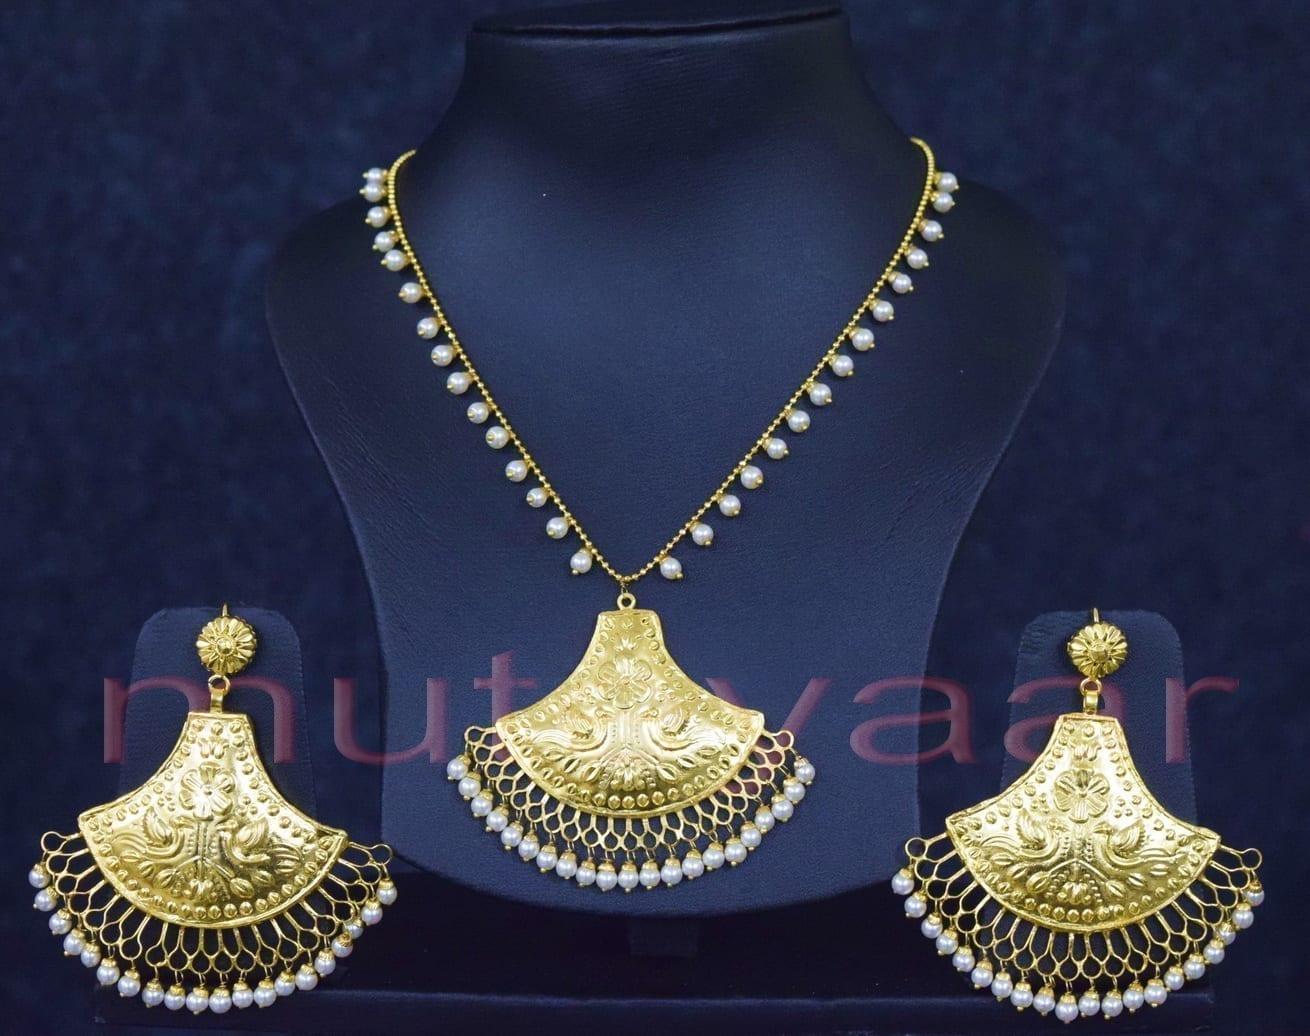 24 Ct. Gold Plated Traditional Punjabi Handmade jewellery Pendant Earrings set J0250 1